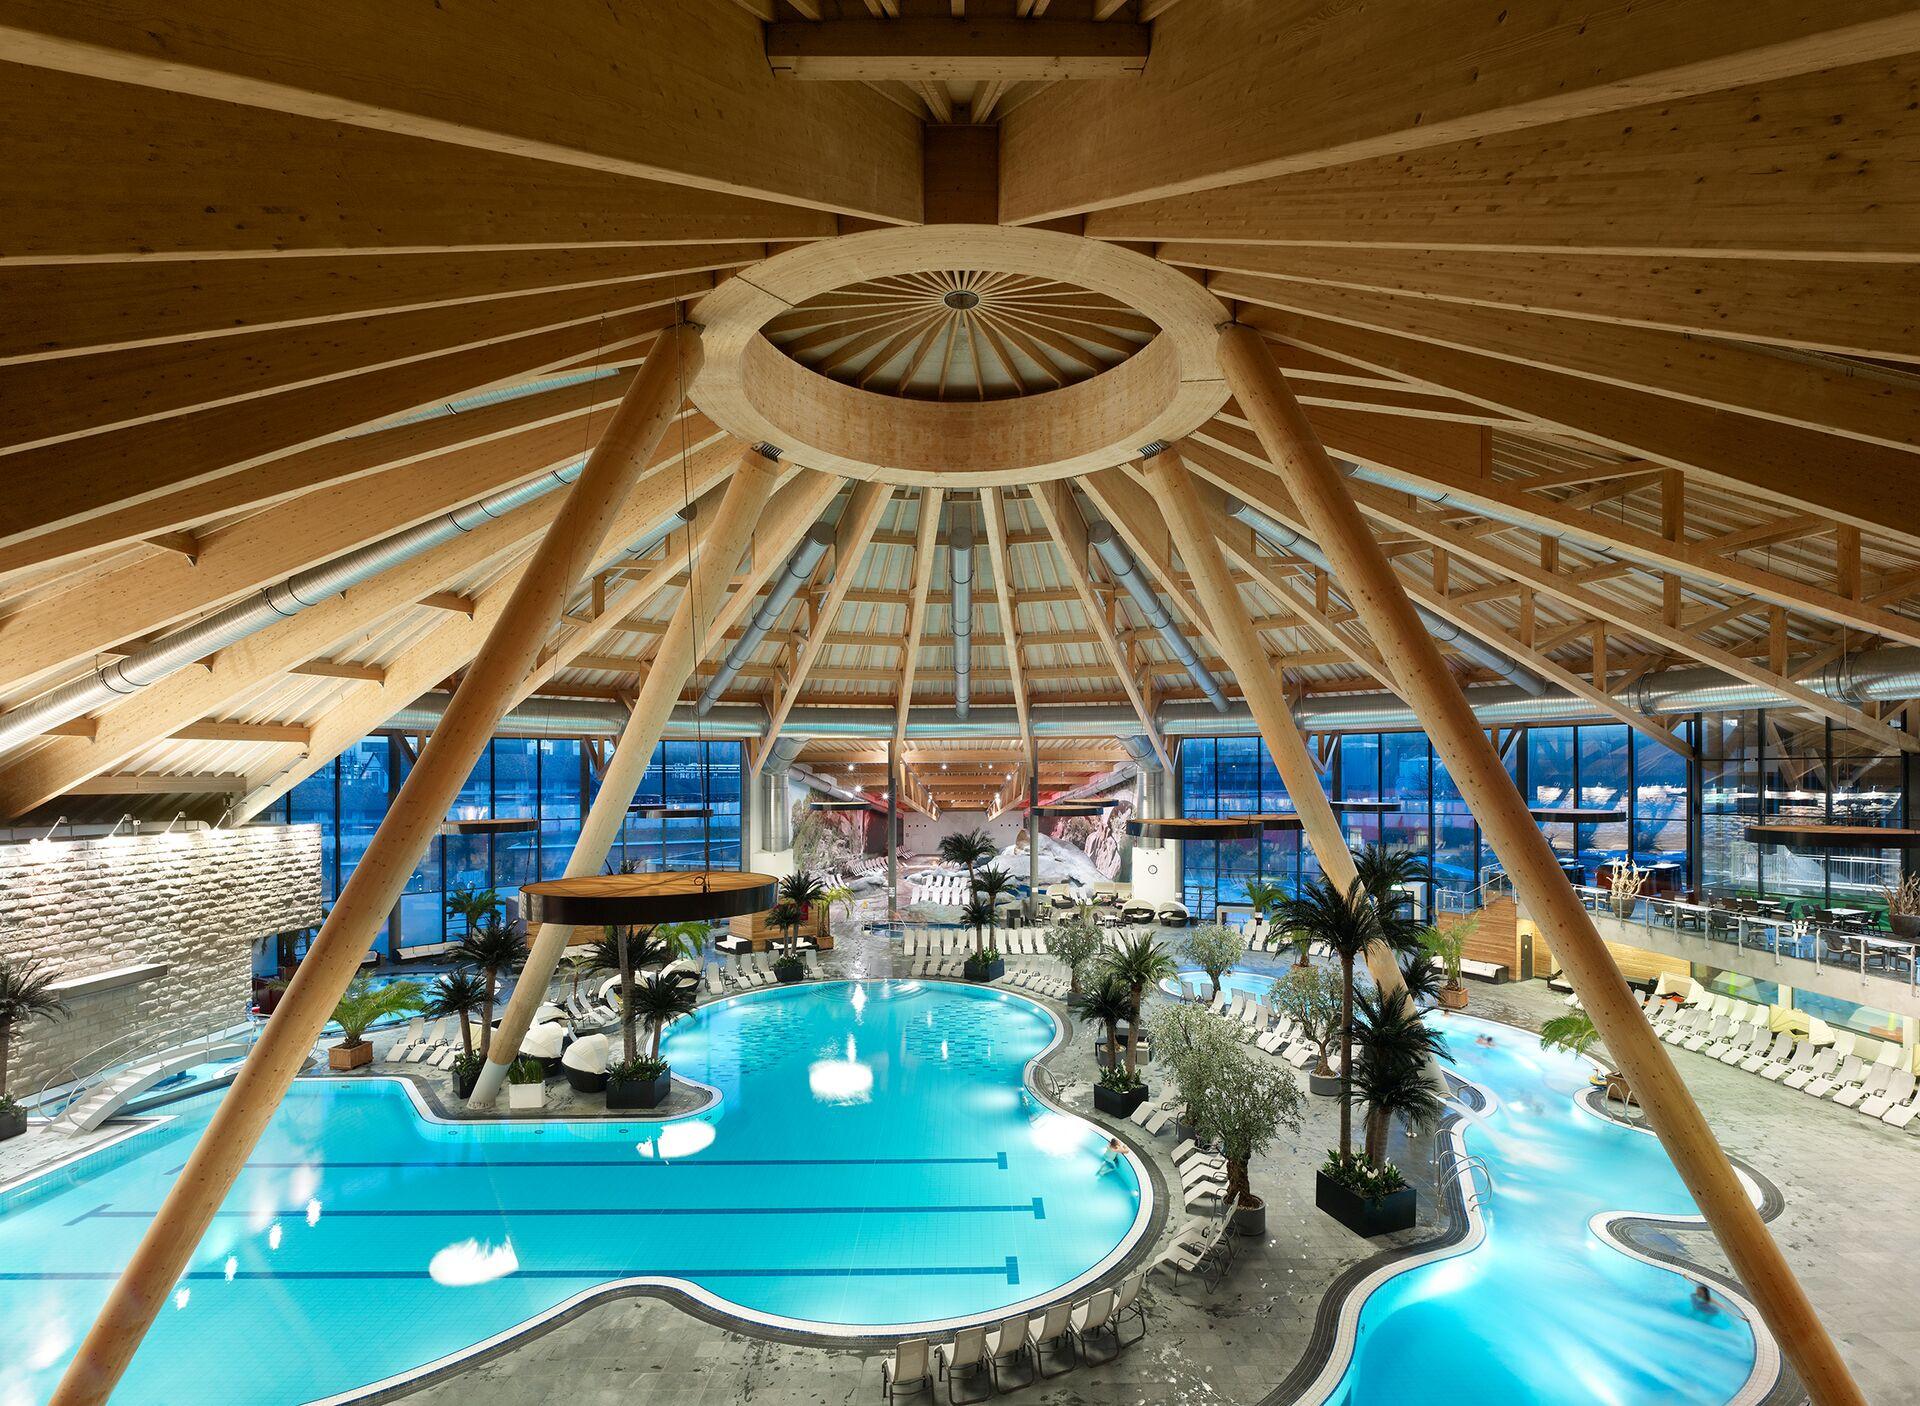 aquabasilea-schwimmbad[1]